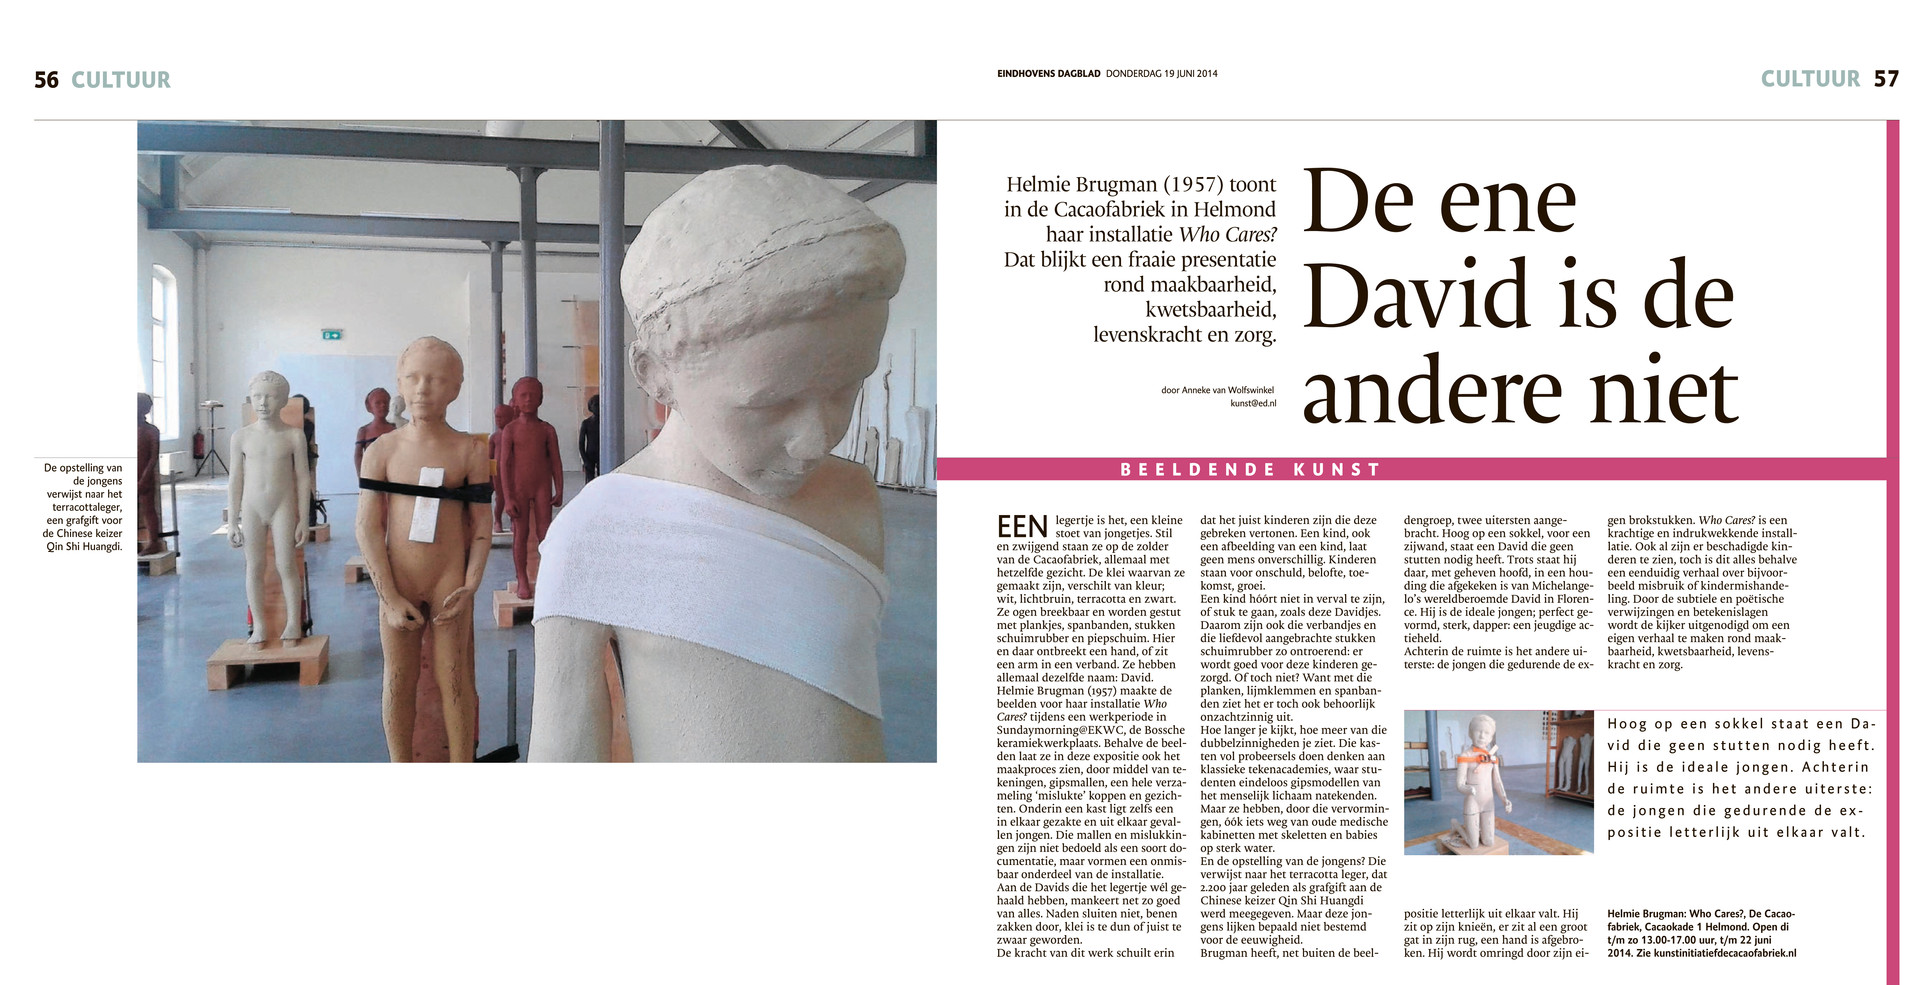 Recensie Eindhovens Dagblad 19-06-2014